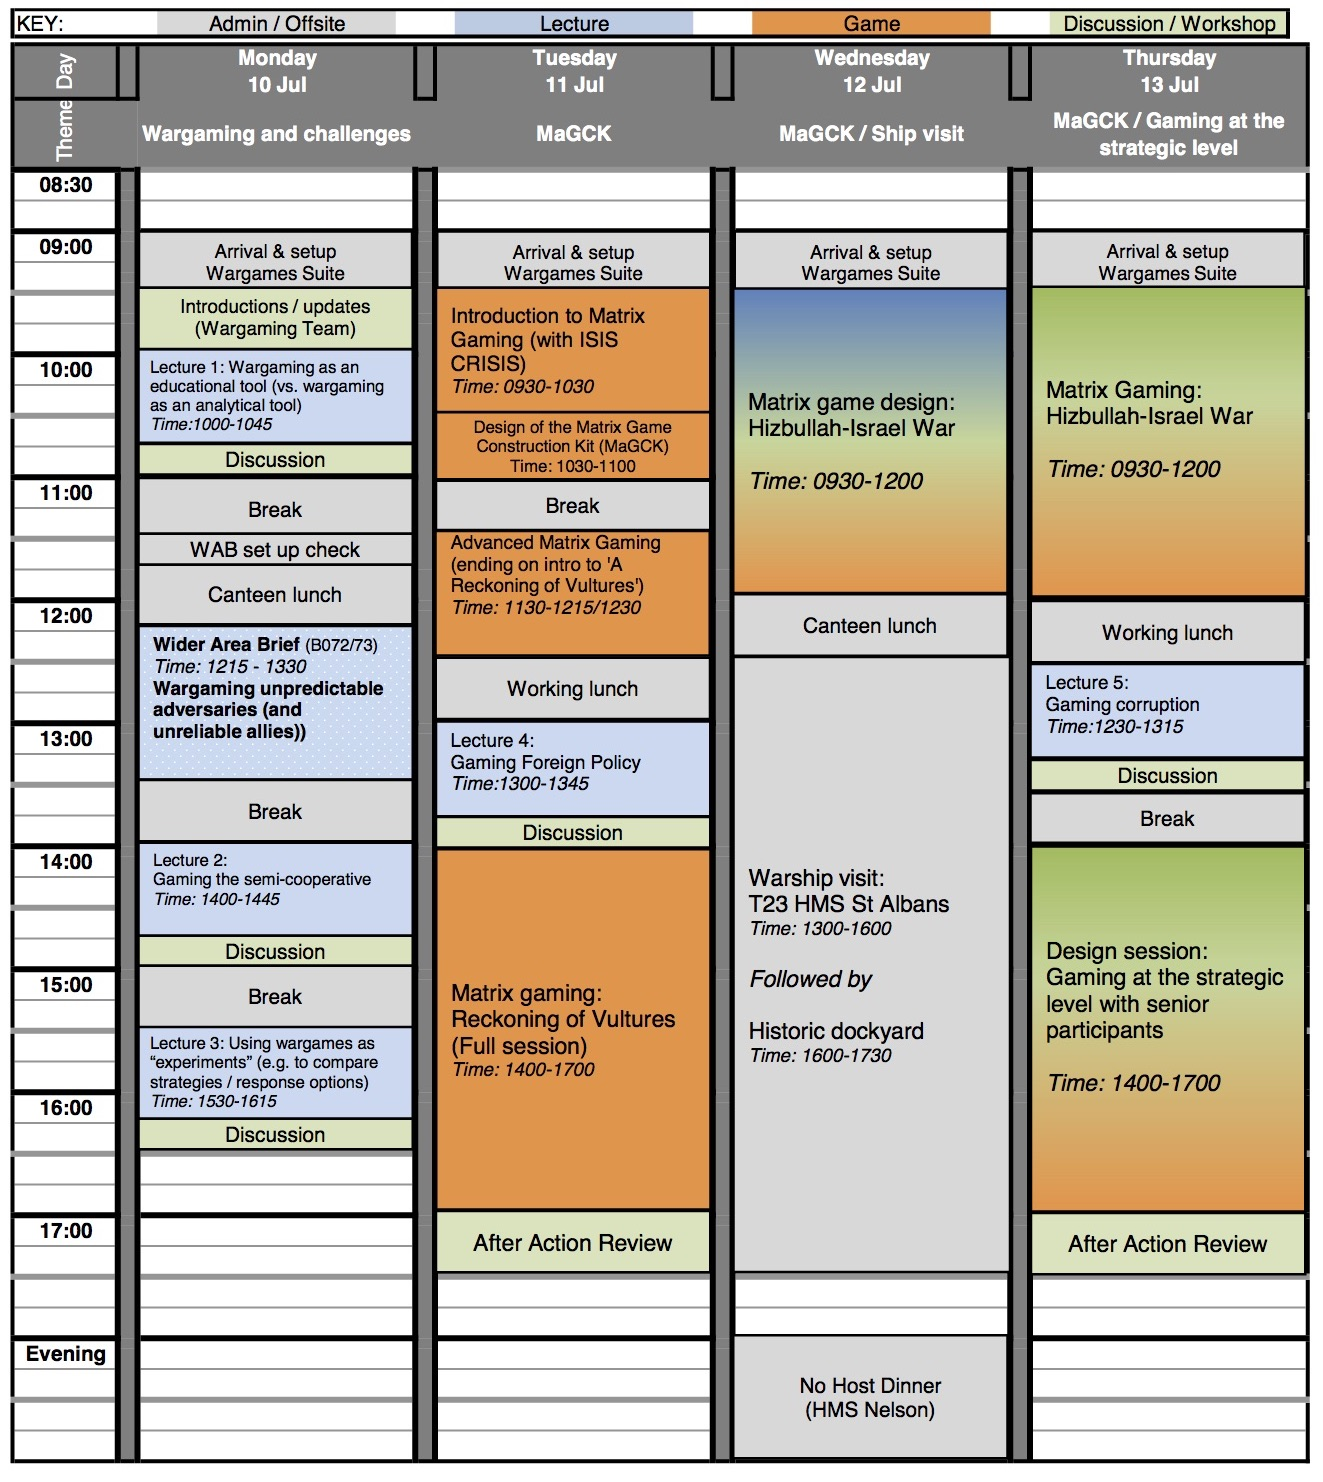 20170728_PAXsims Agenda